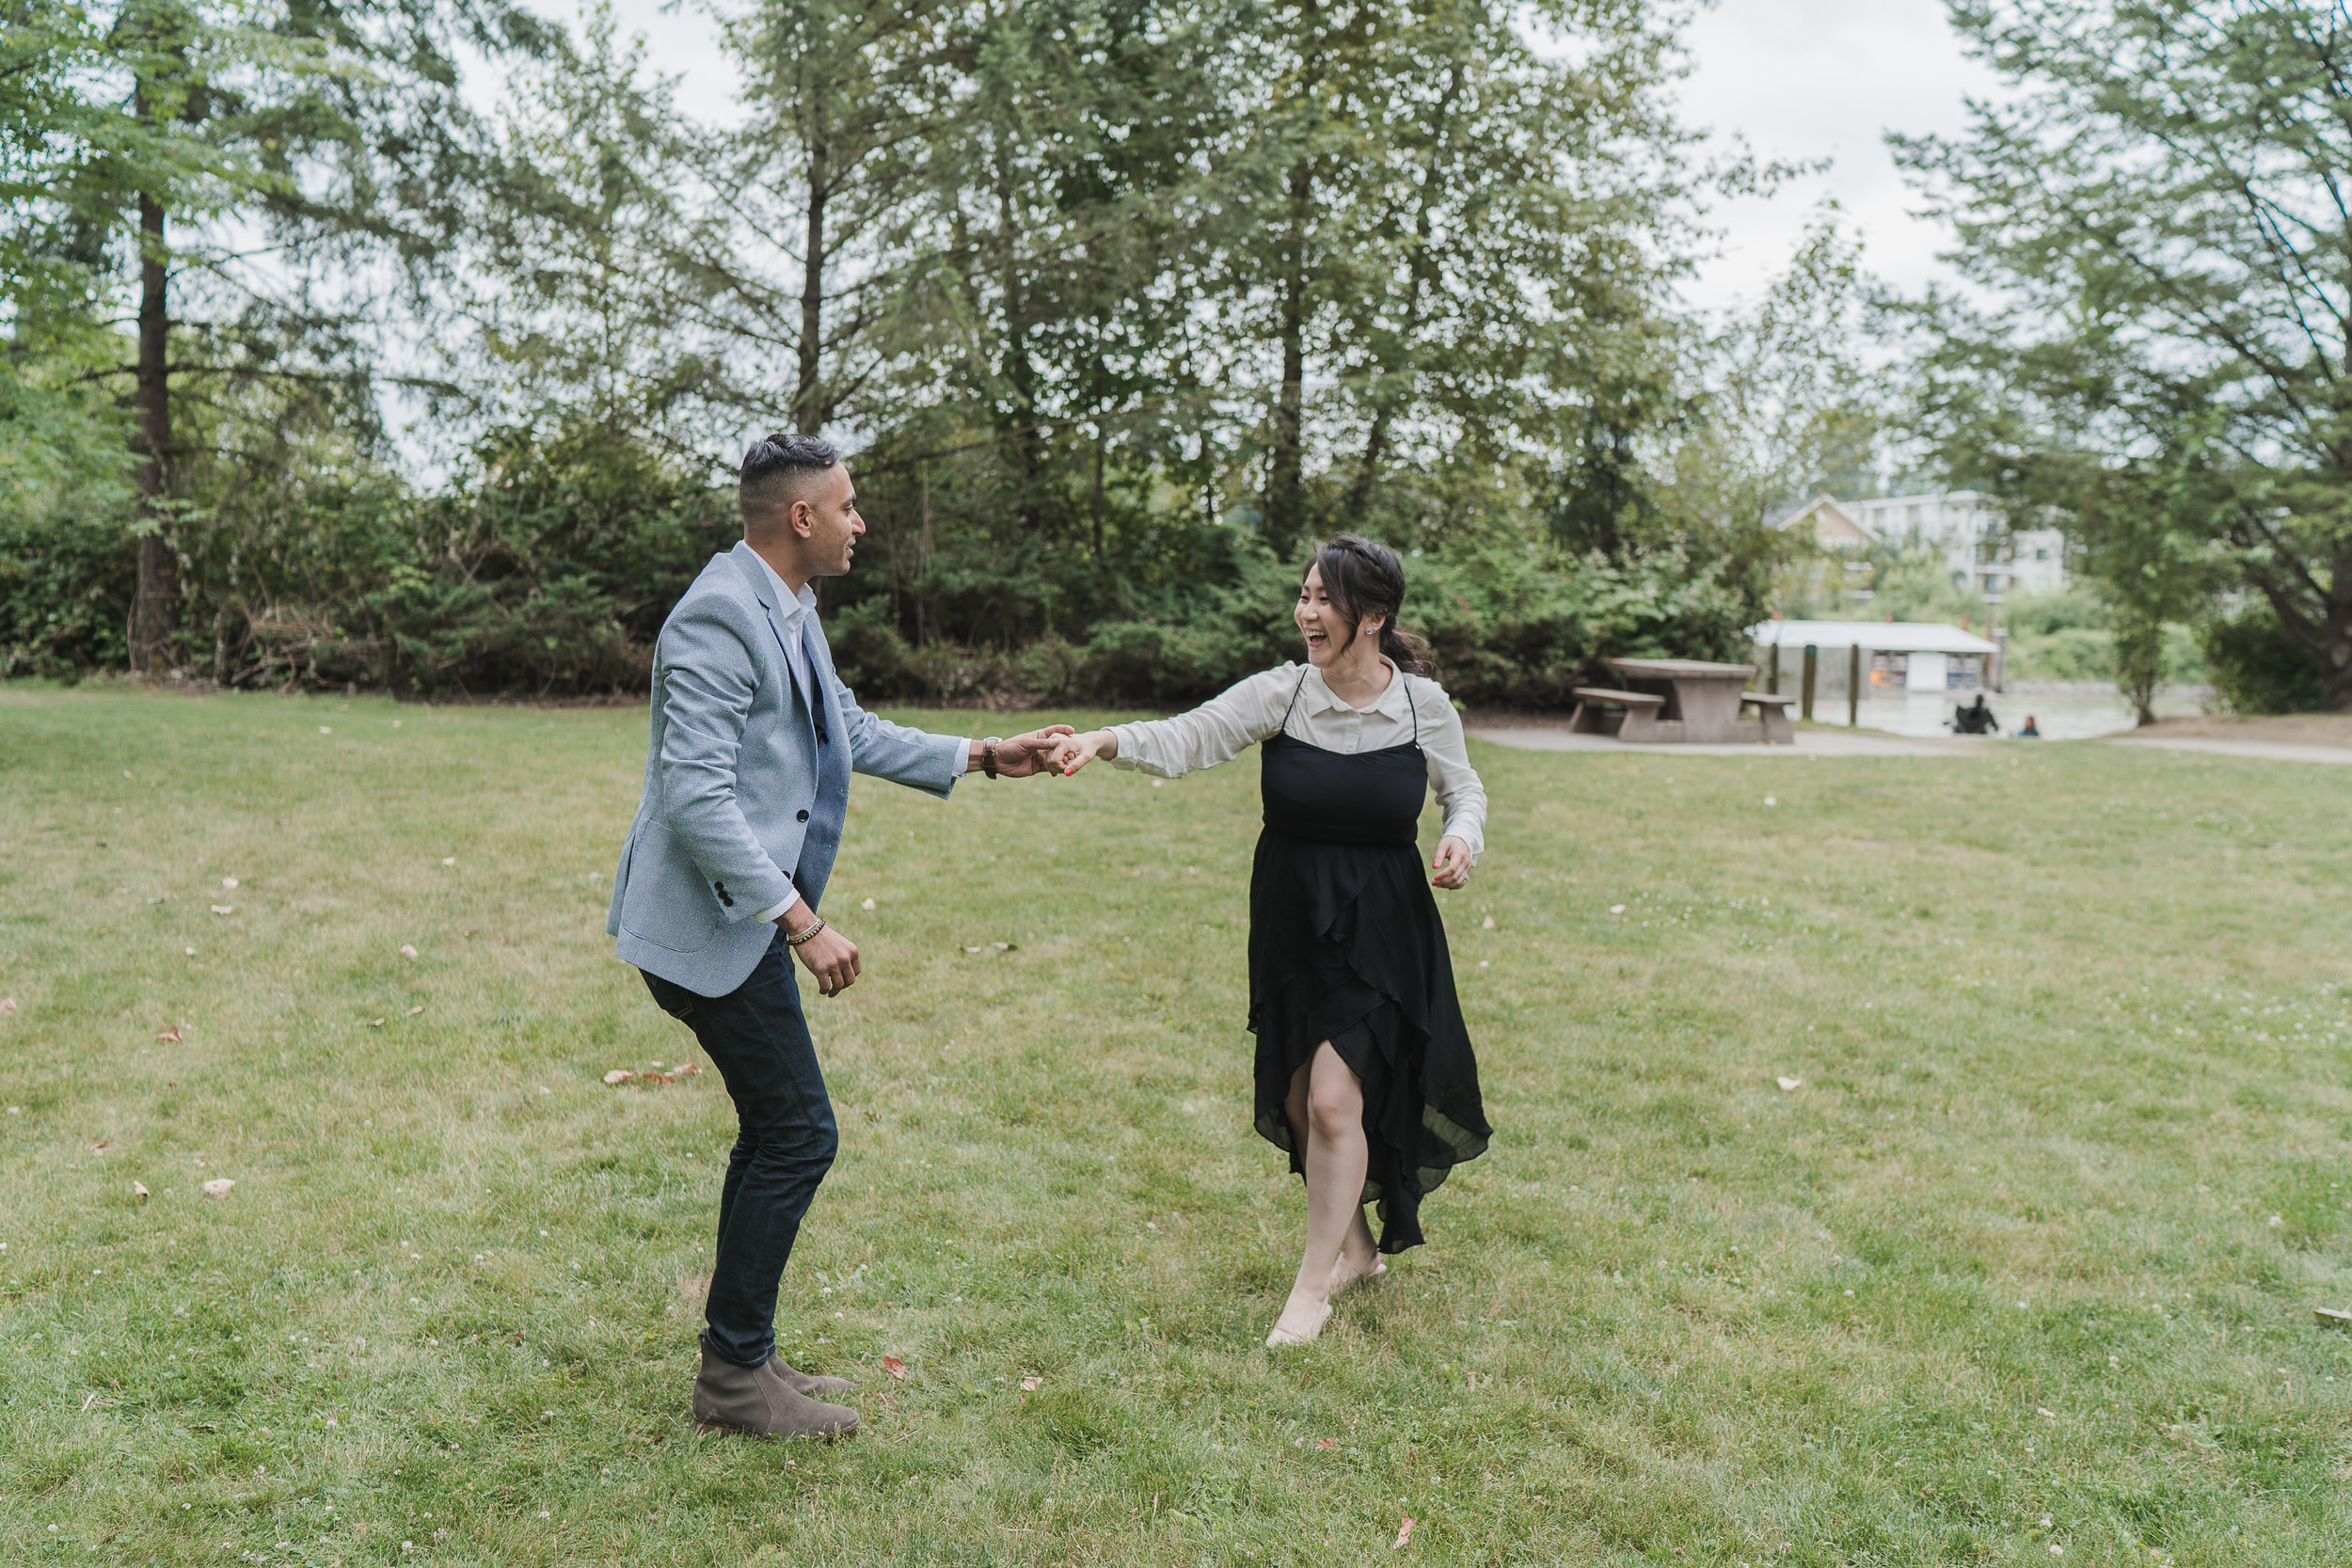 20190622 - Monika & Johnson Engagement- 0060.jpg